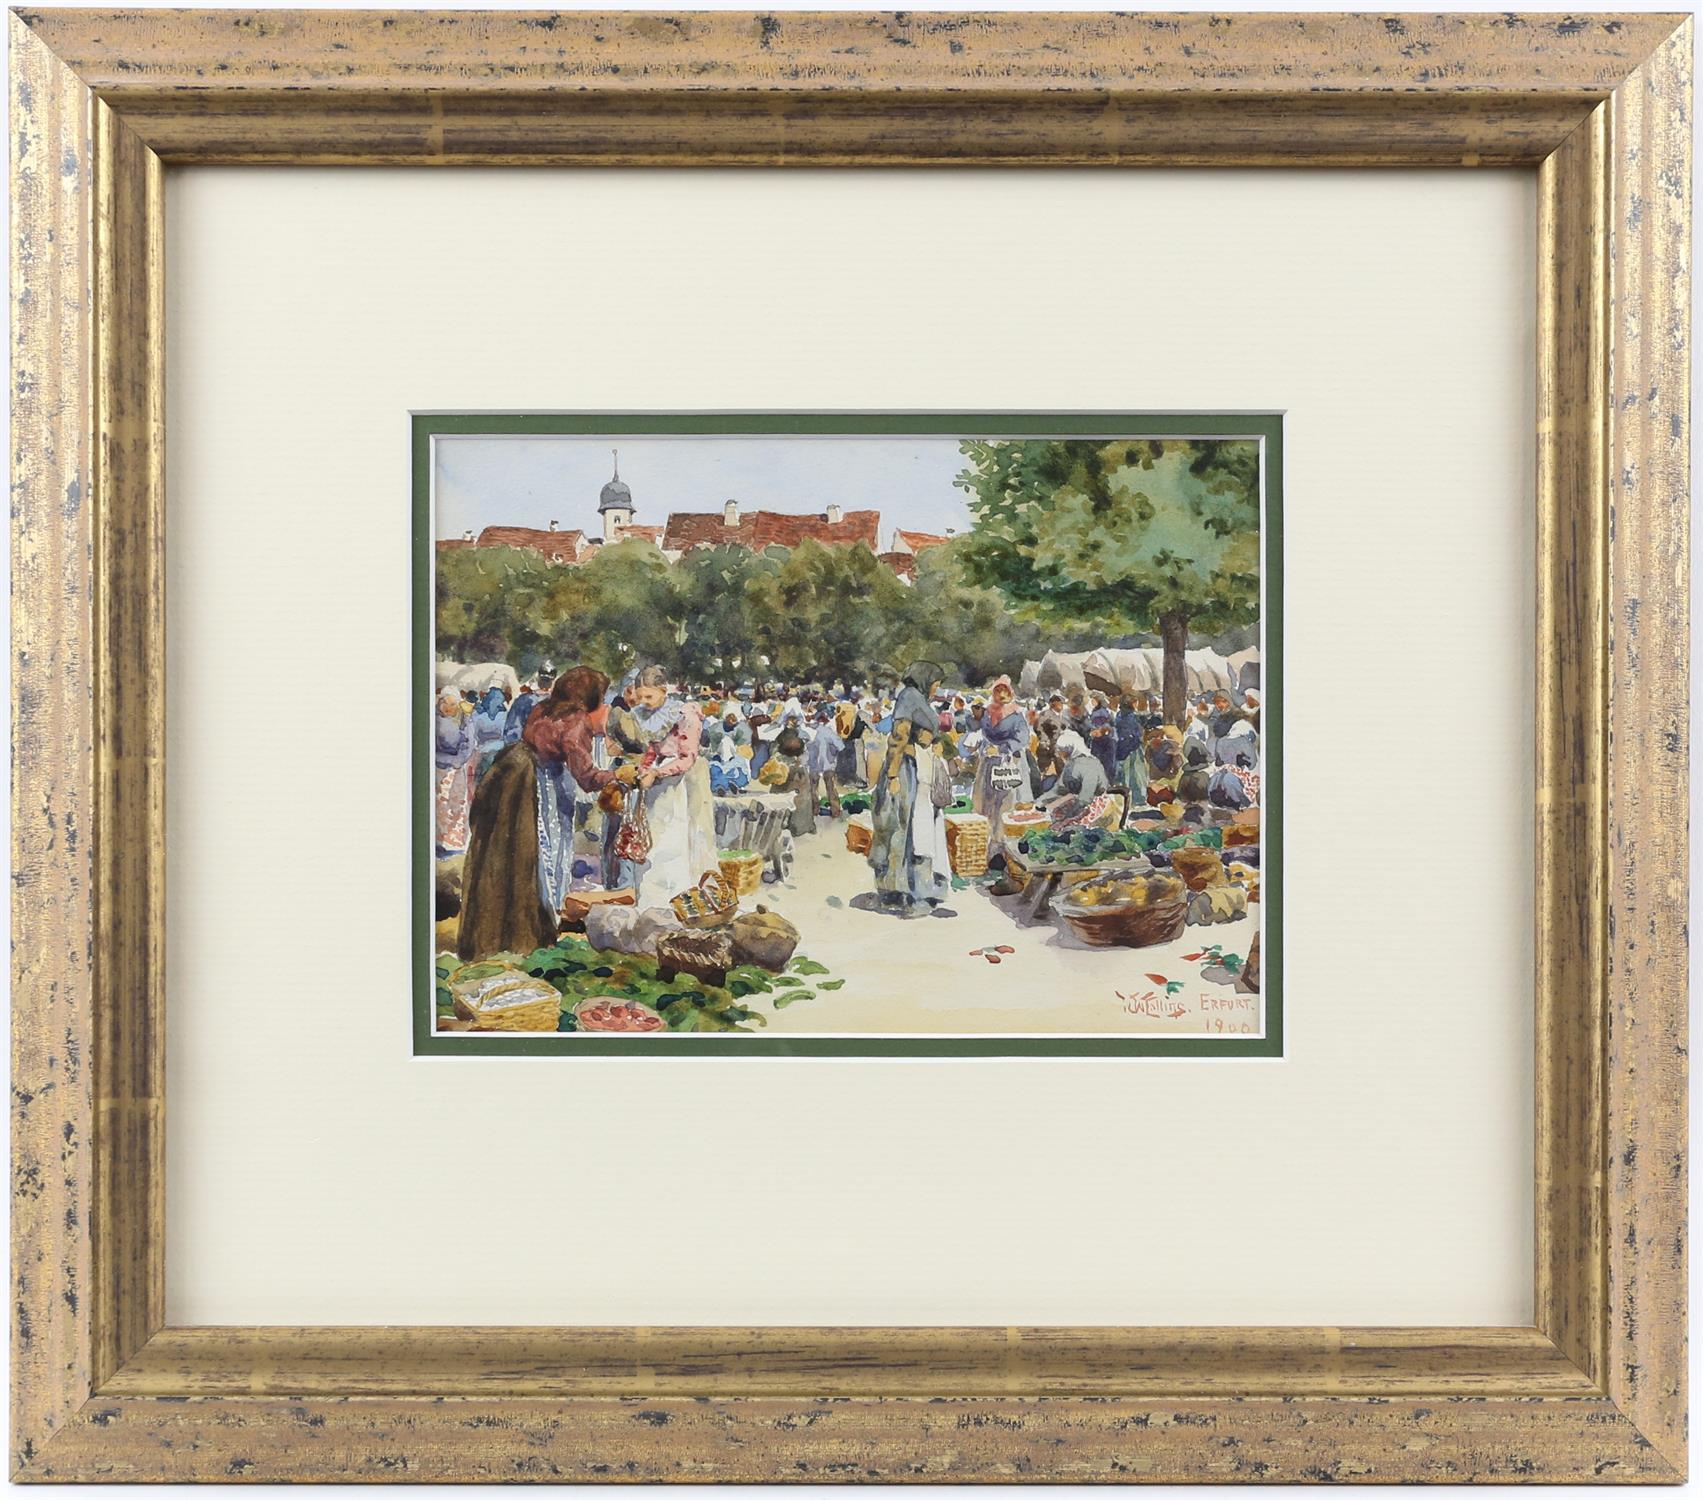 William Wiehe Collins, British 1862-1951, 'Erfurt', market scene, signed and dated 1900, - Image 2 of 4